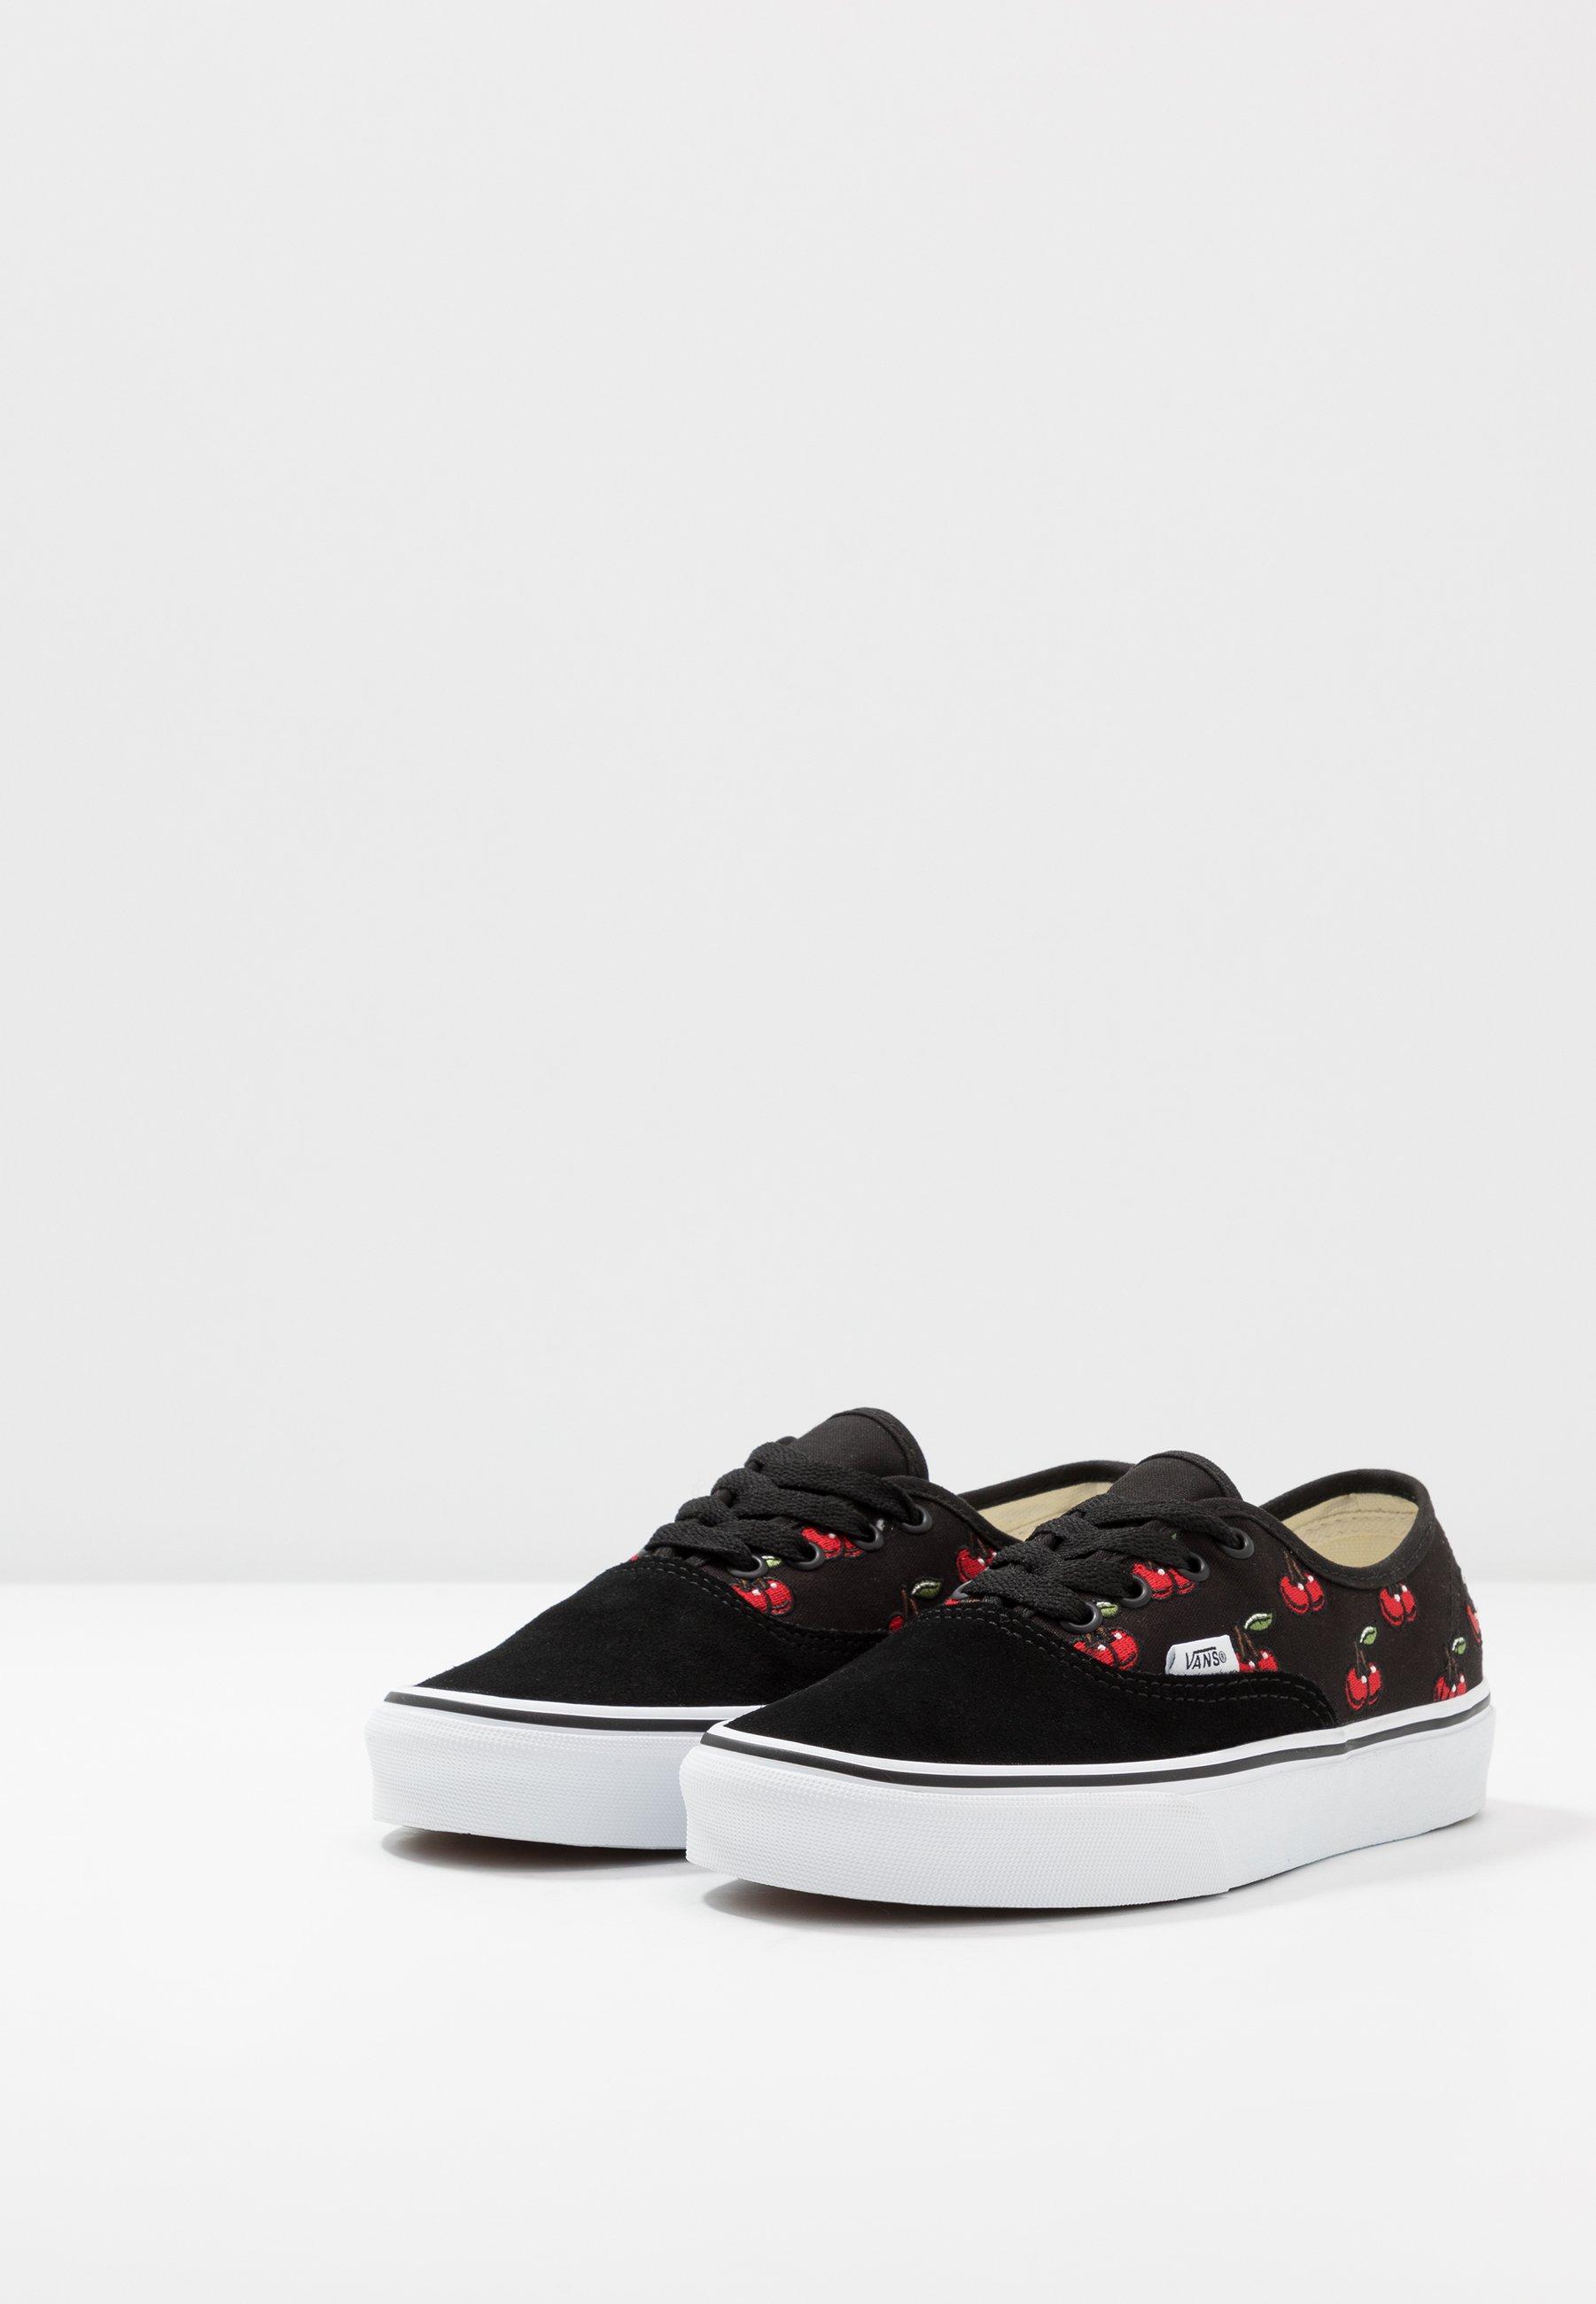 Vans Authentic - Sneakers Black